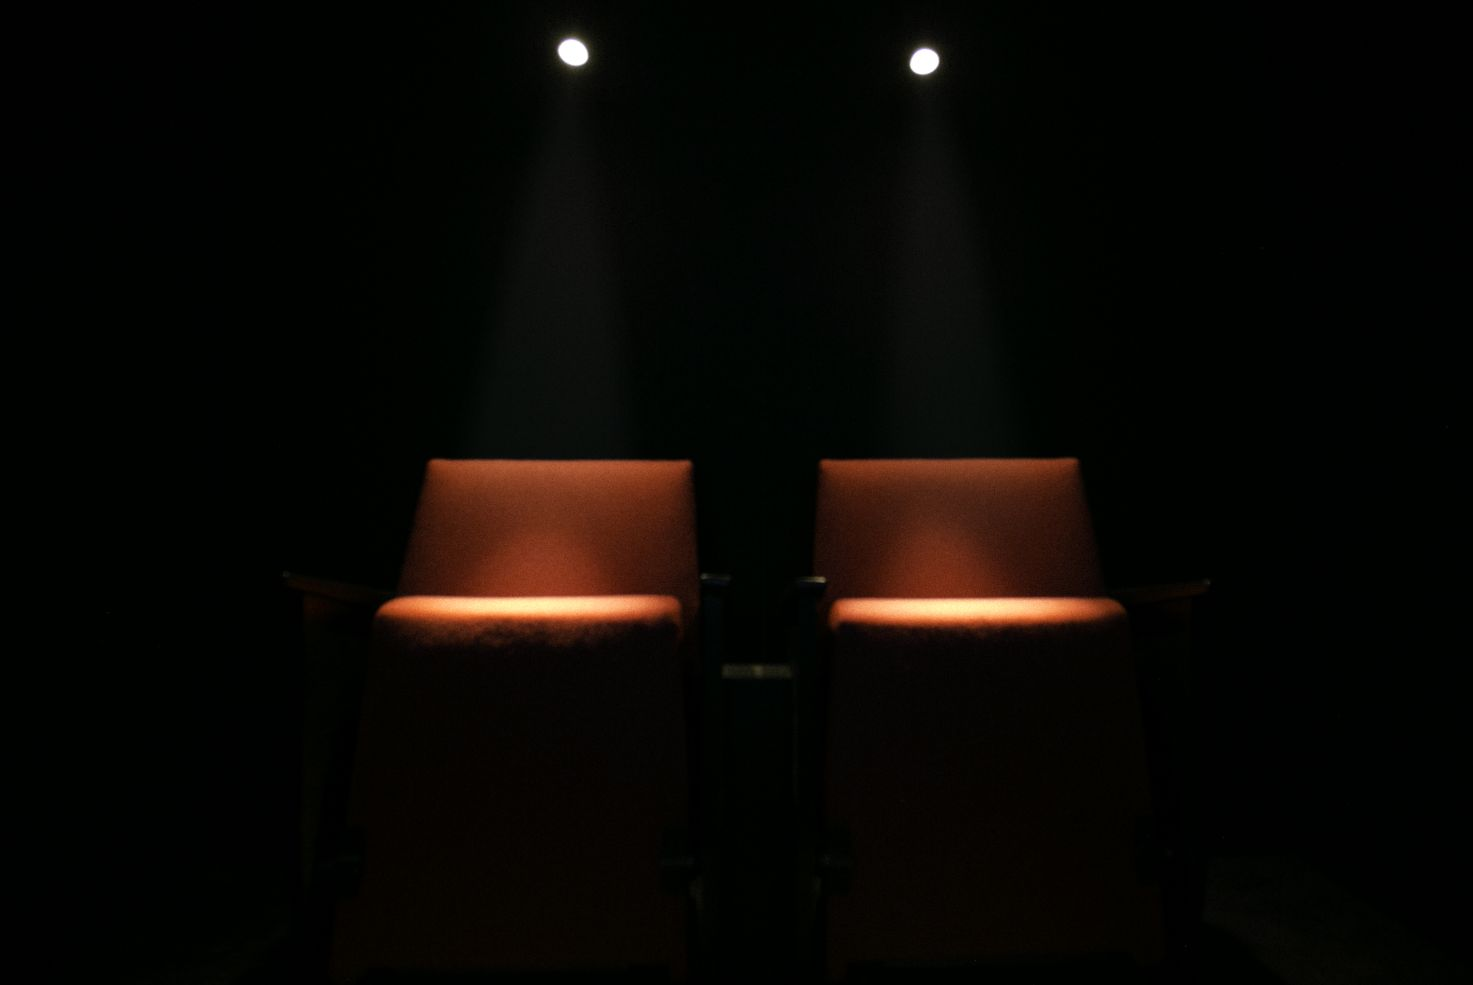 Helsinki Airport Brings Strangers Together to Experience 'Cinema in HEL'